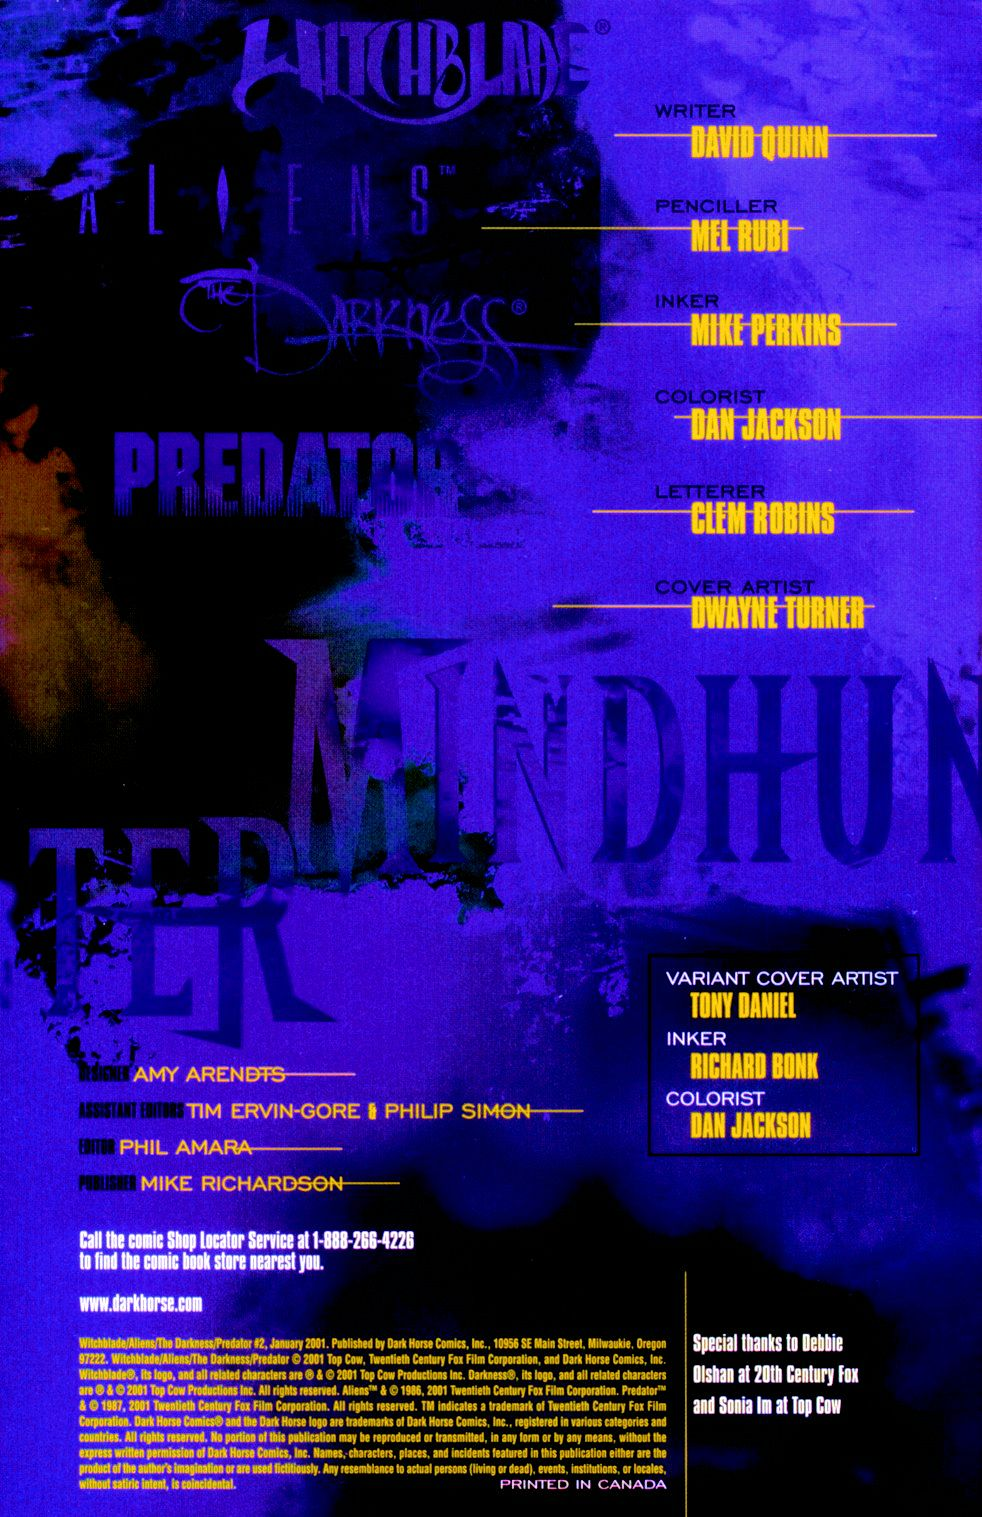 Witchblade/Aliens/The Darkness/Predator: Mindhunter 2 Page 2